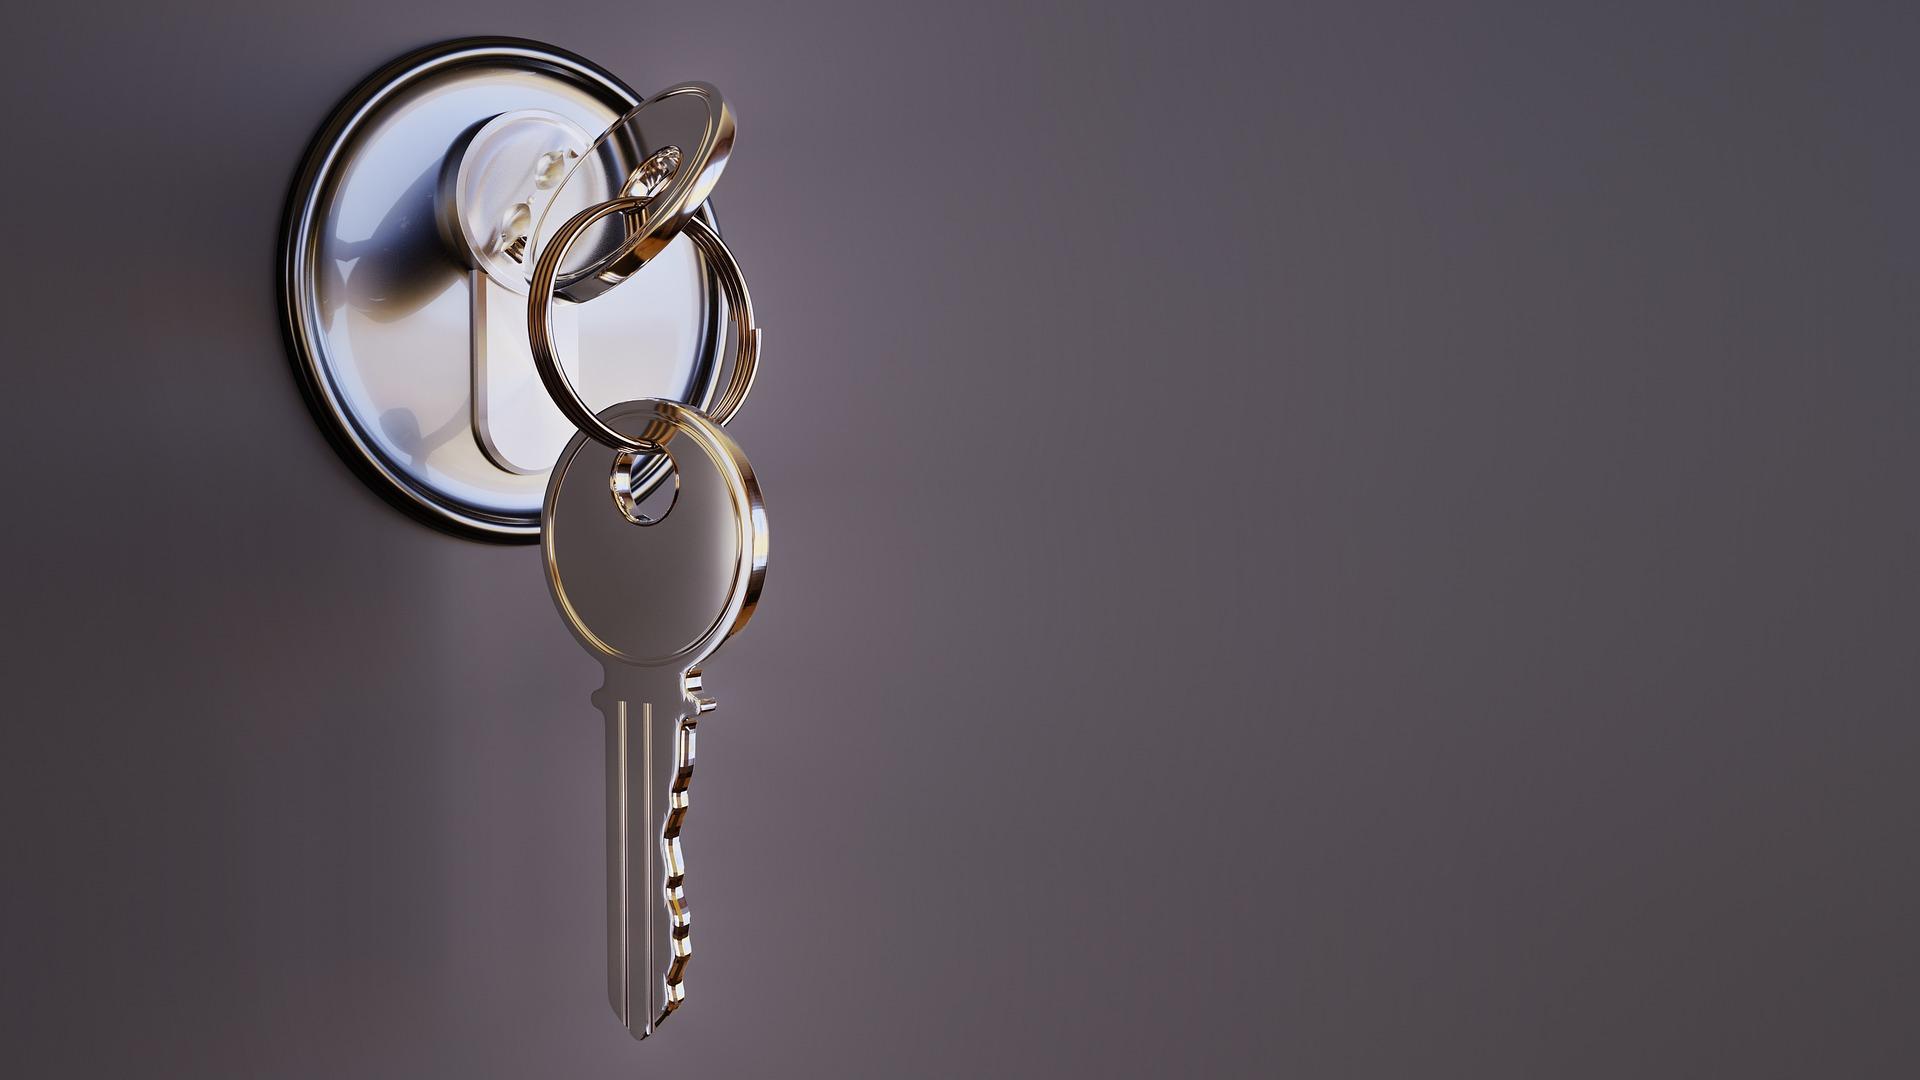 Top Toronto Ontario Real Estate Agent